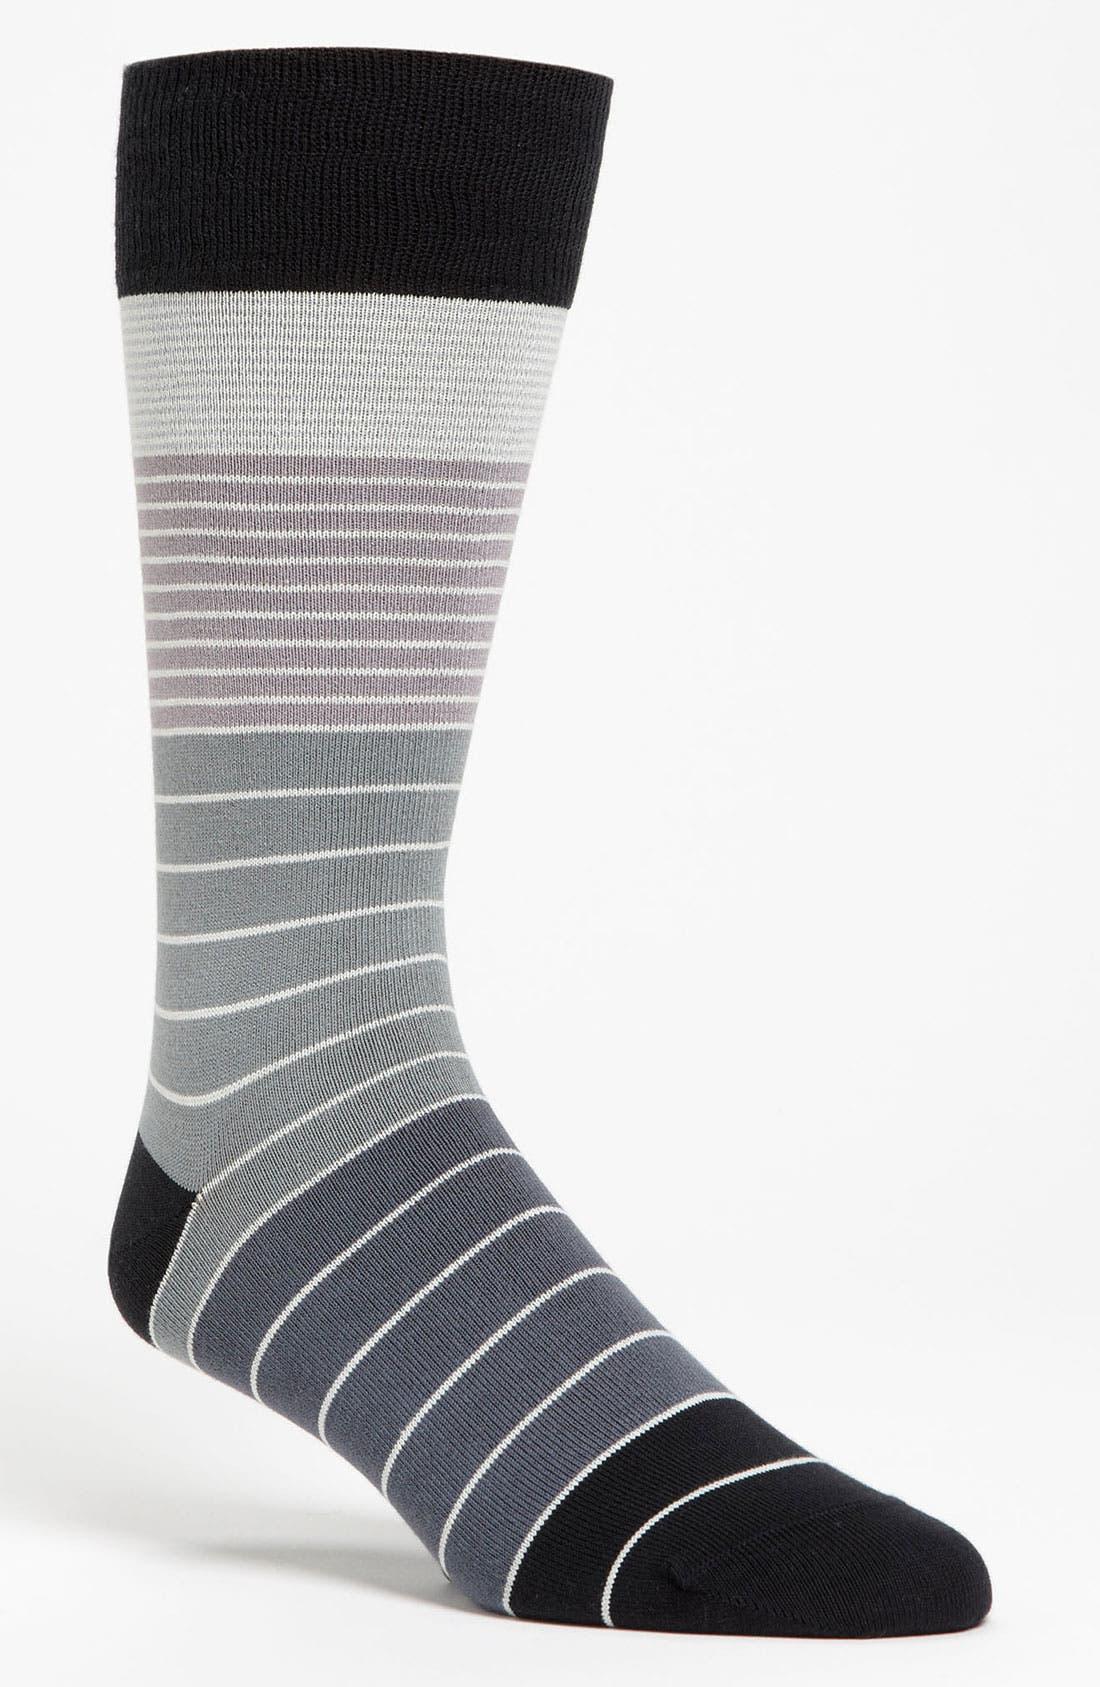 PAUL SMITH Accessories Colorblock Stripe Socks, Main, color, 001